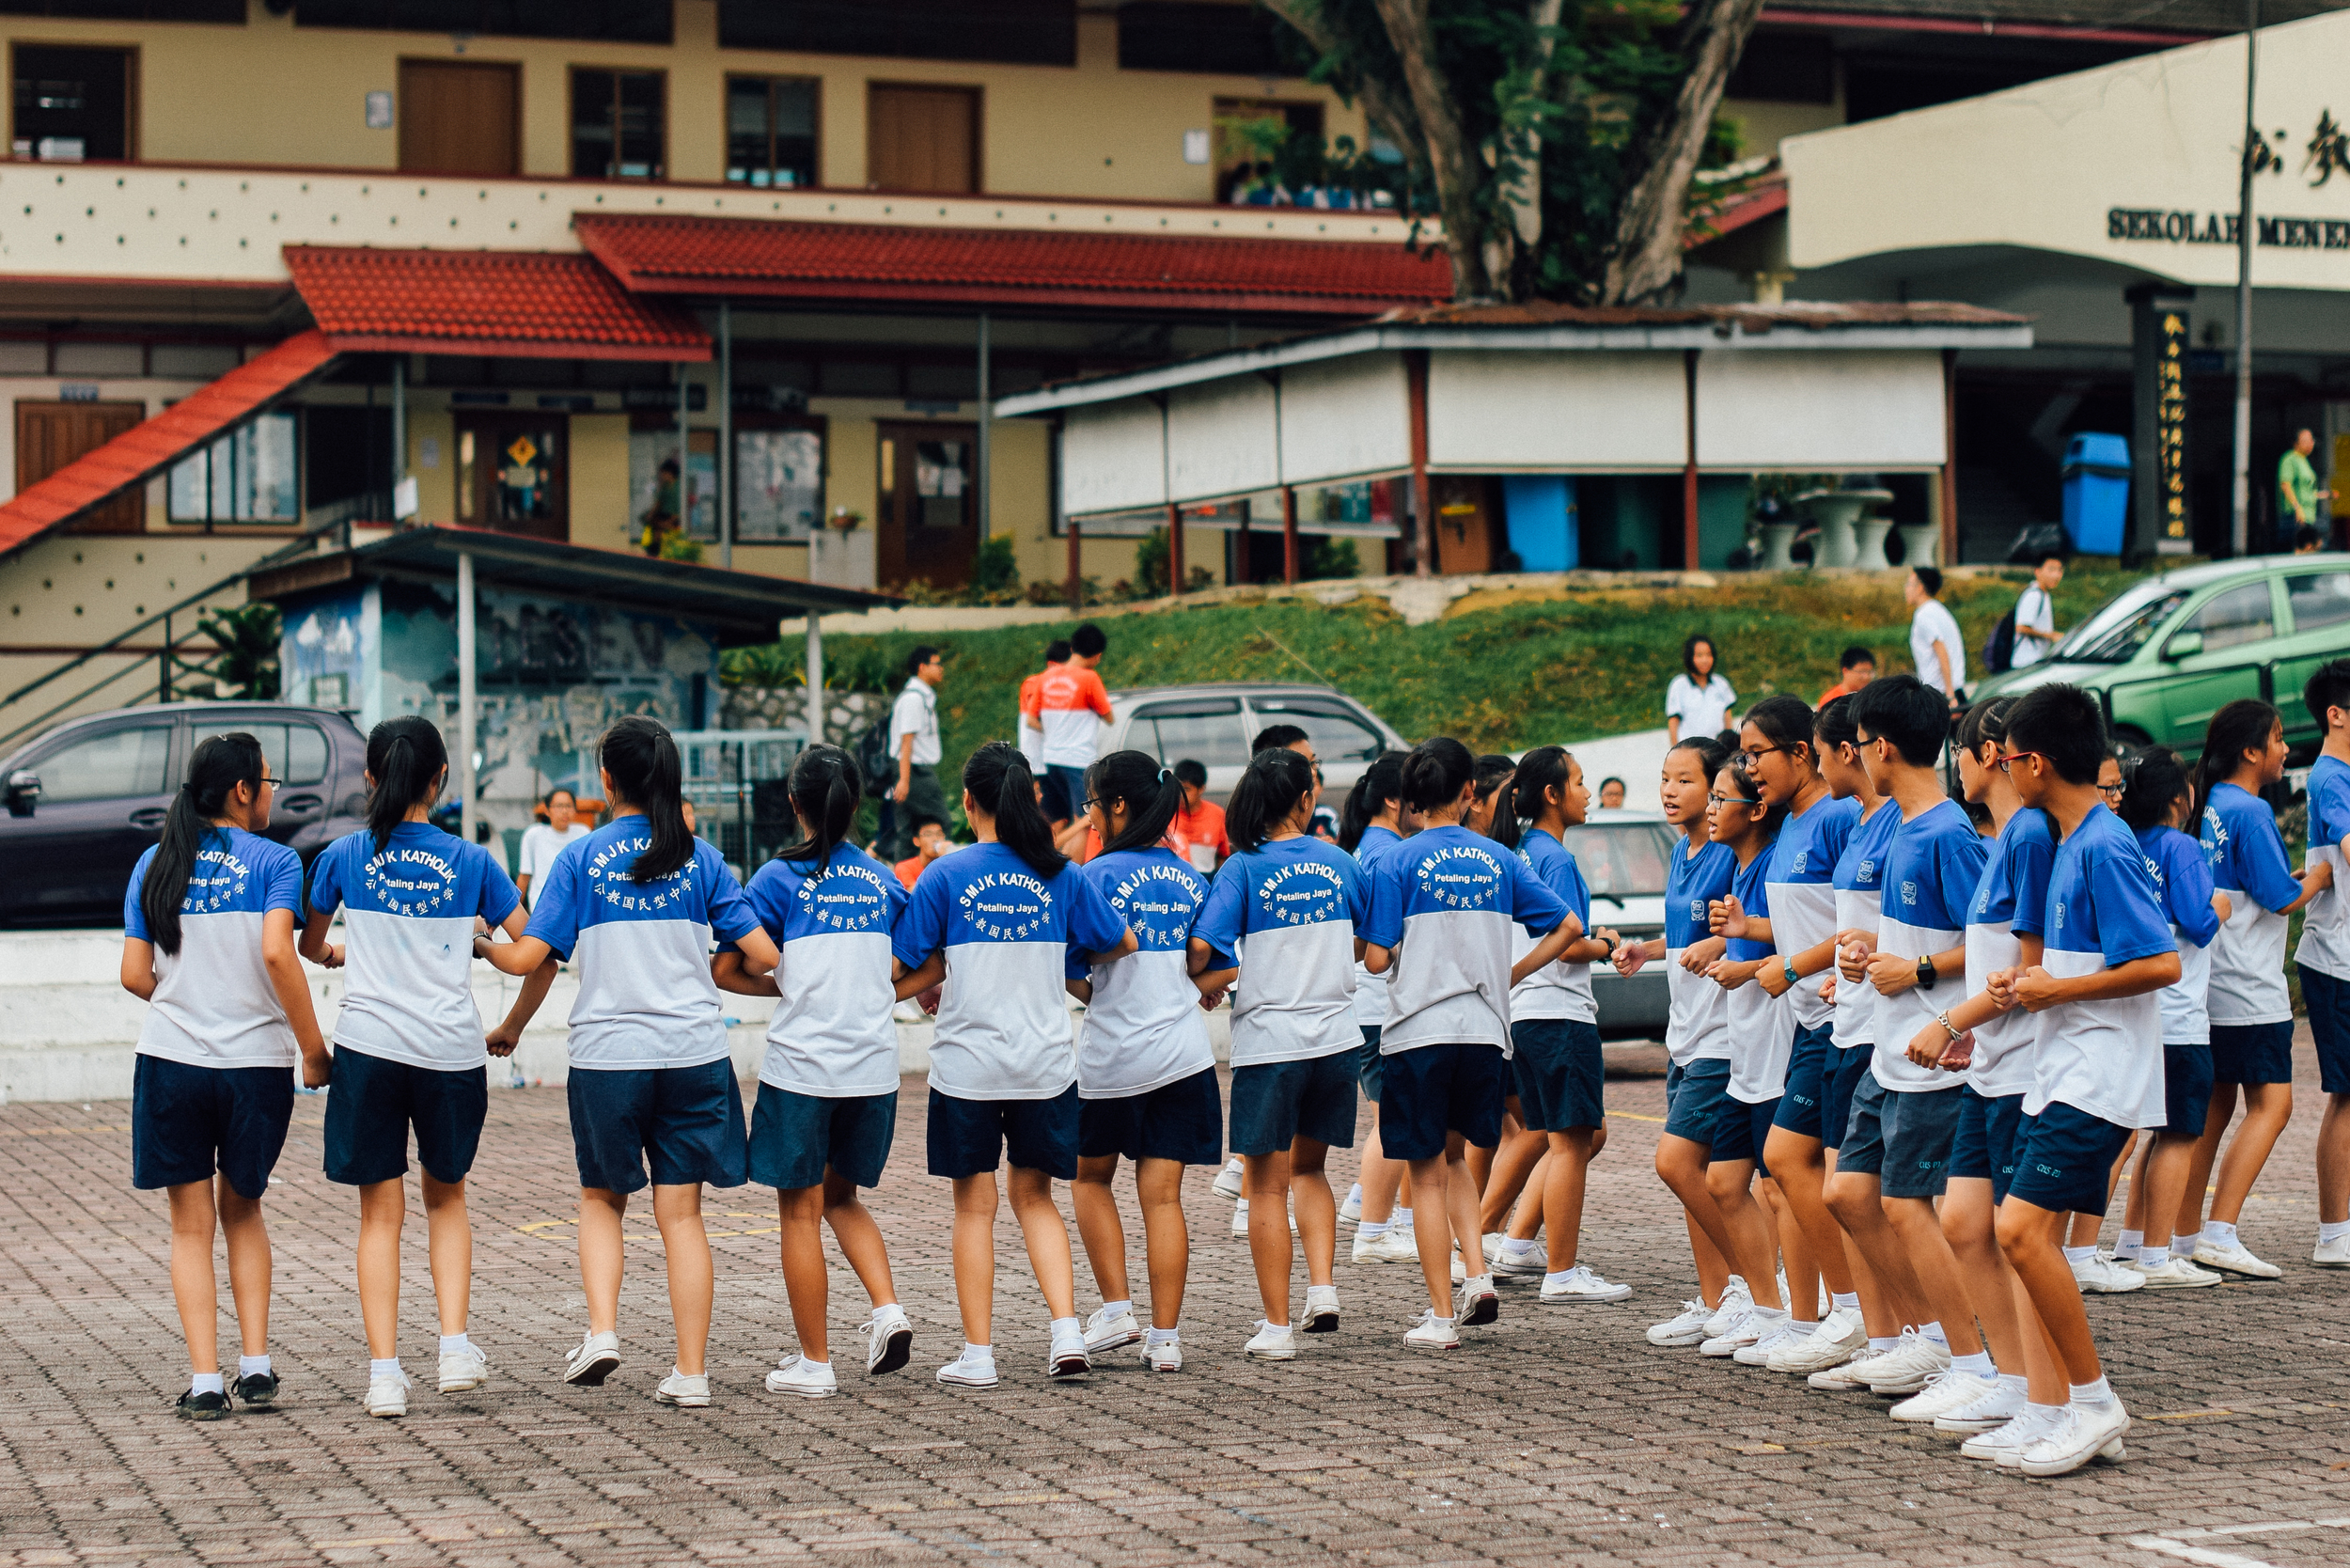 Catholic High School PJ | A Beautiful Distraction